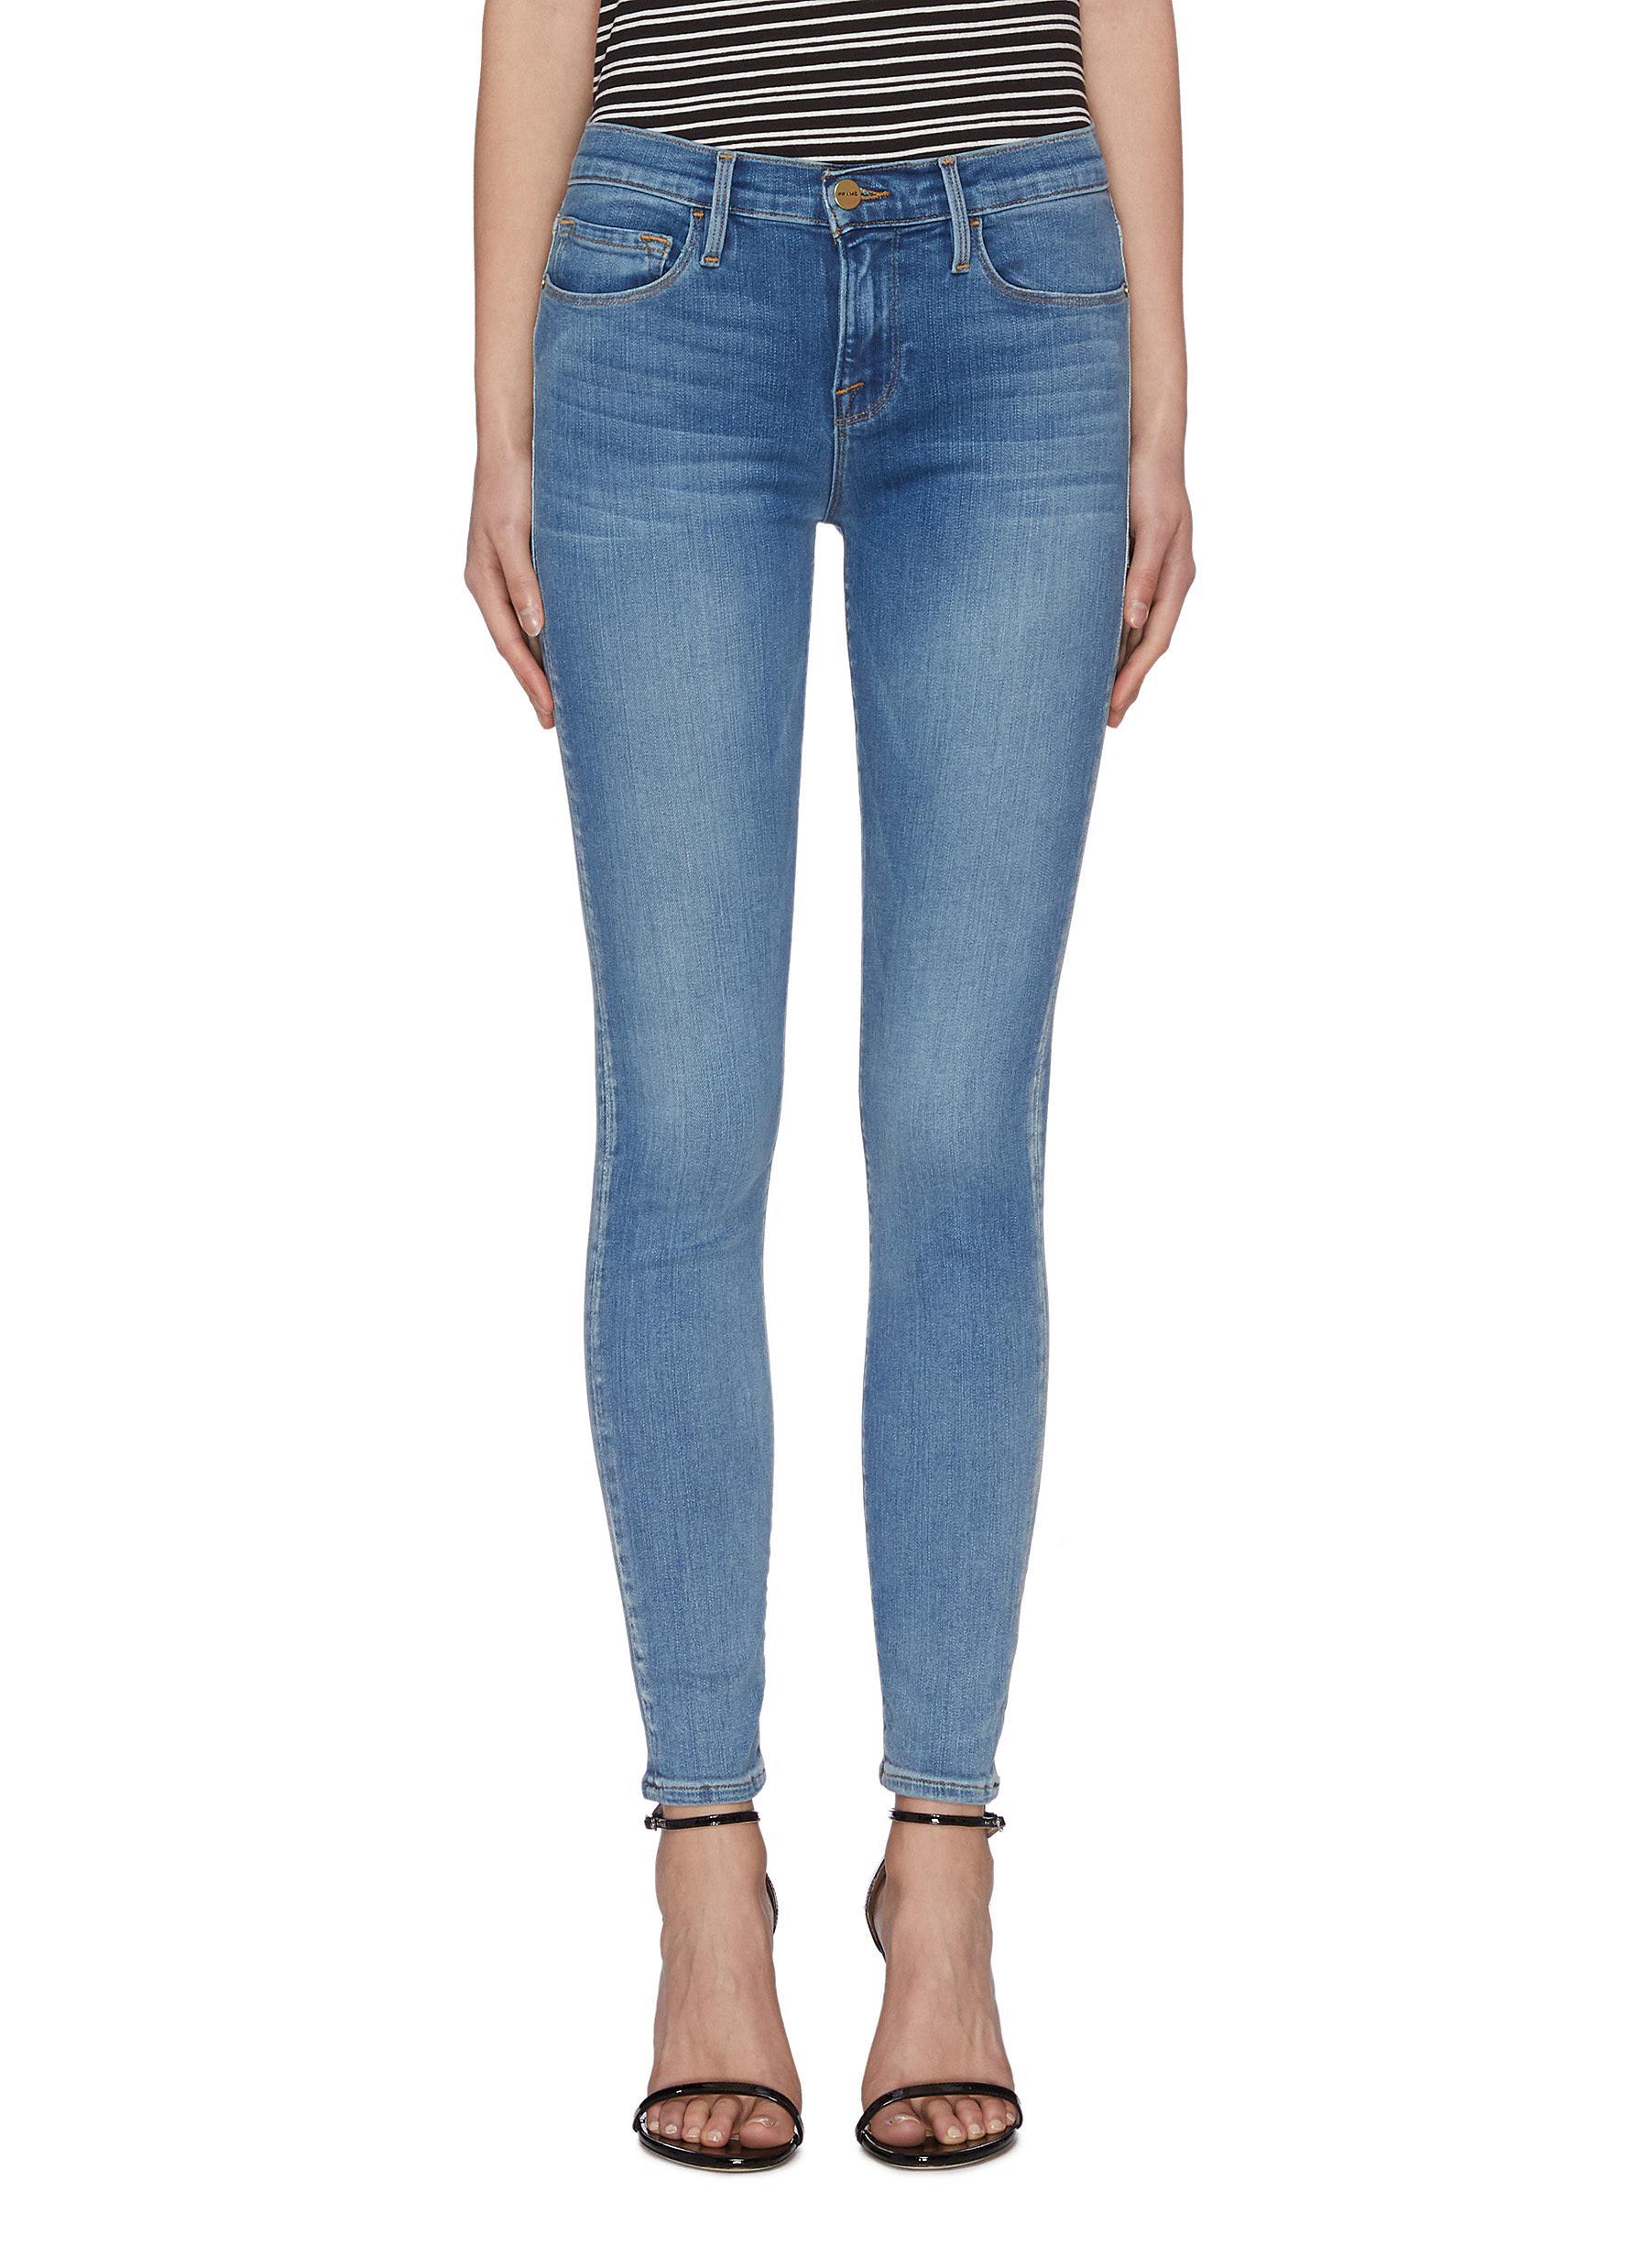 Buy Frame Denim Jeans 'Le Skinny De Jeanne' jeans